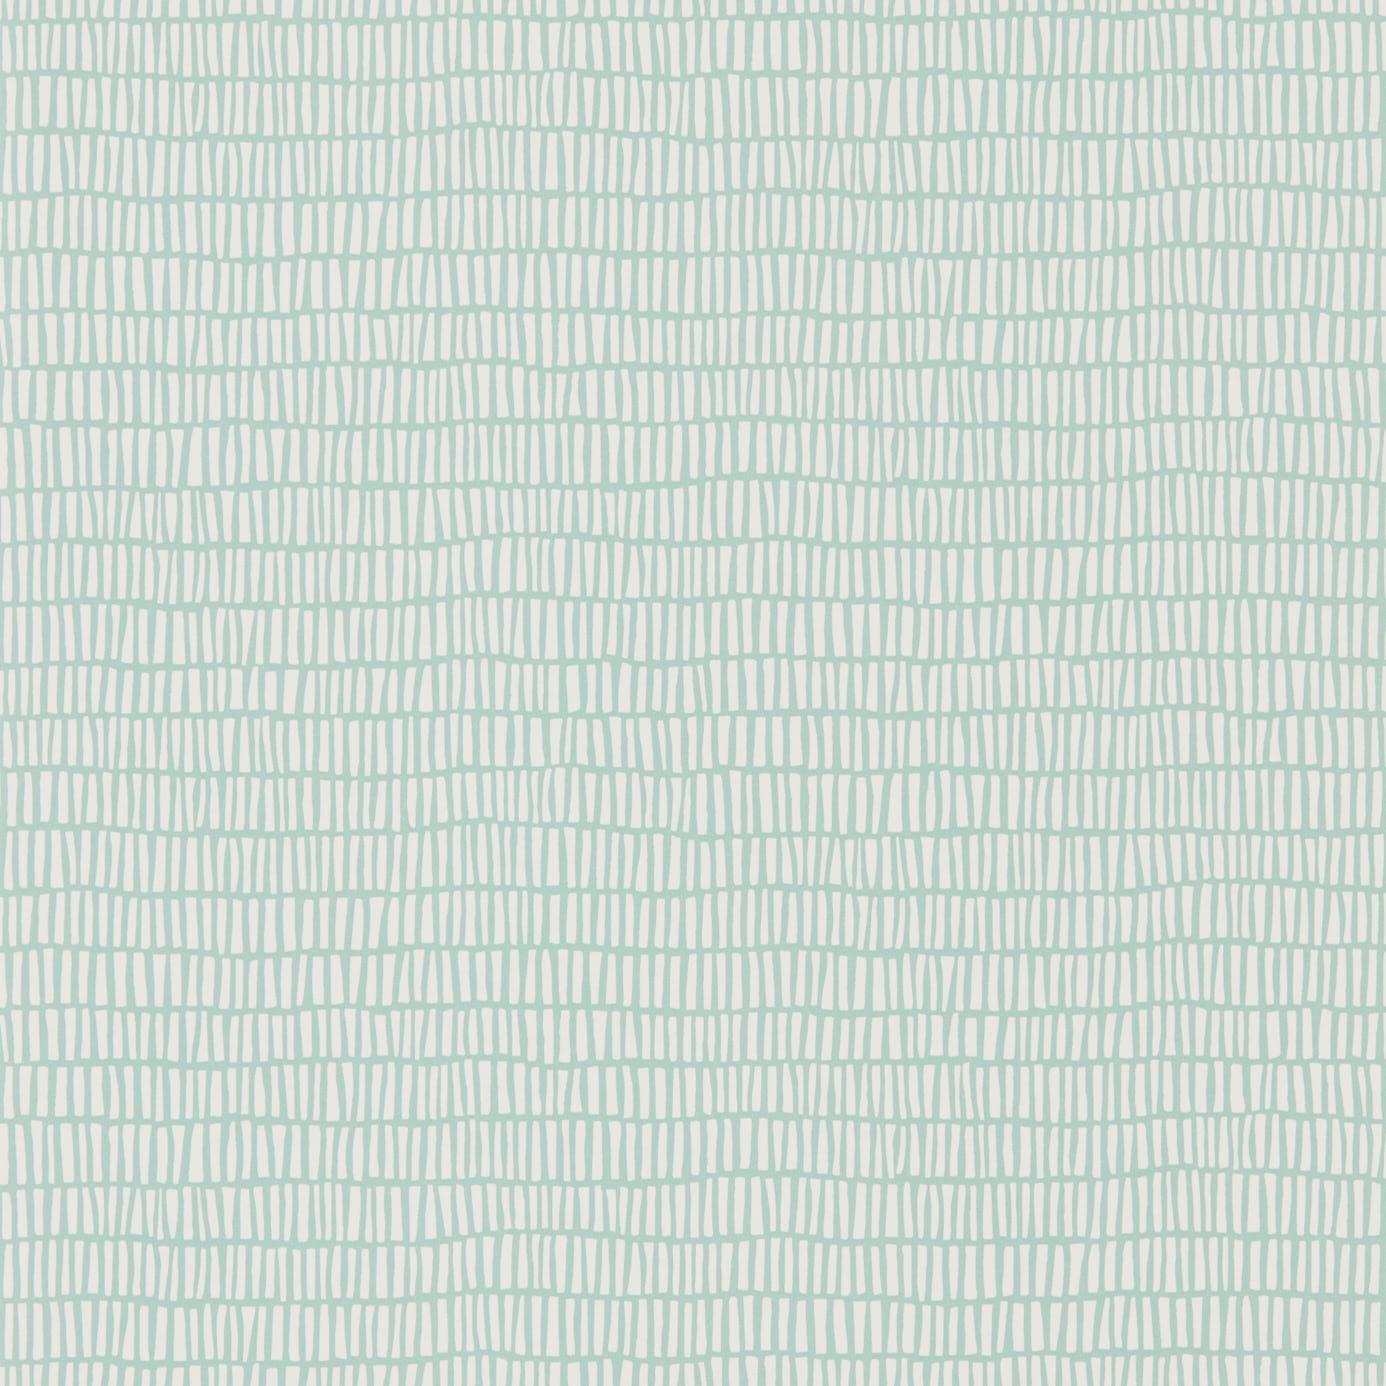 Английские обои Scion,  коллекция Lohko, артикул111316